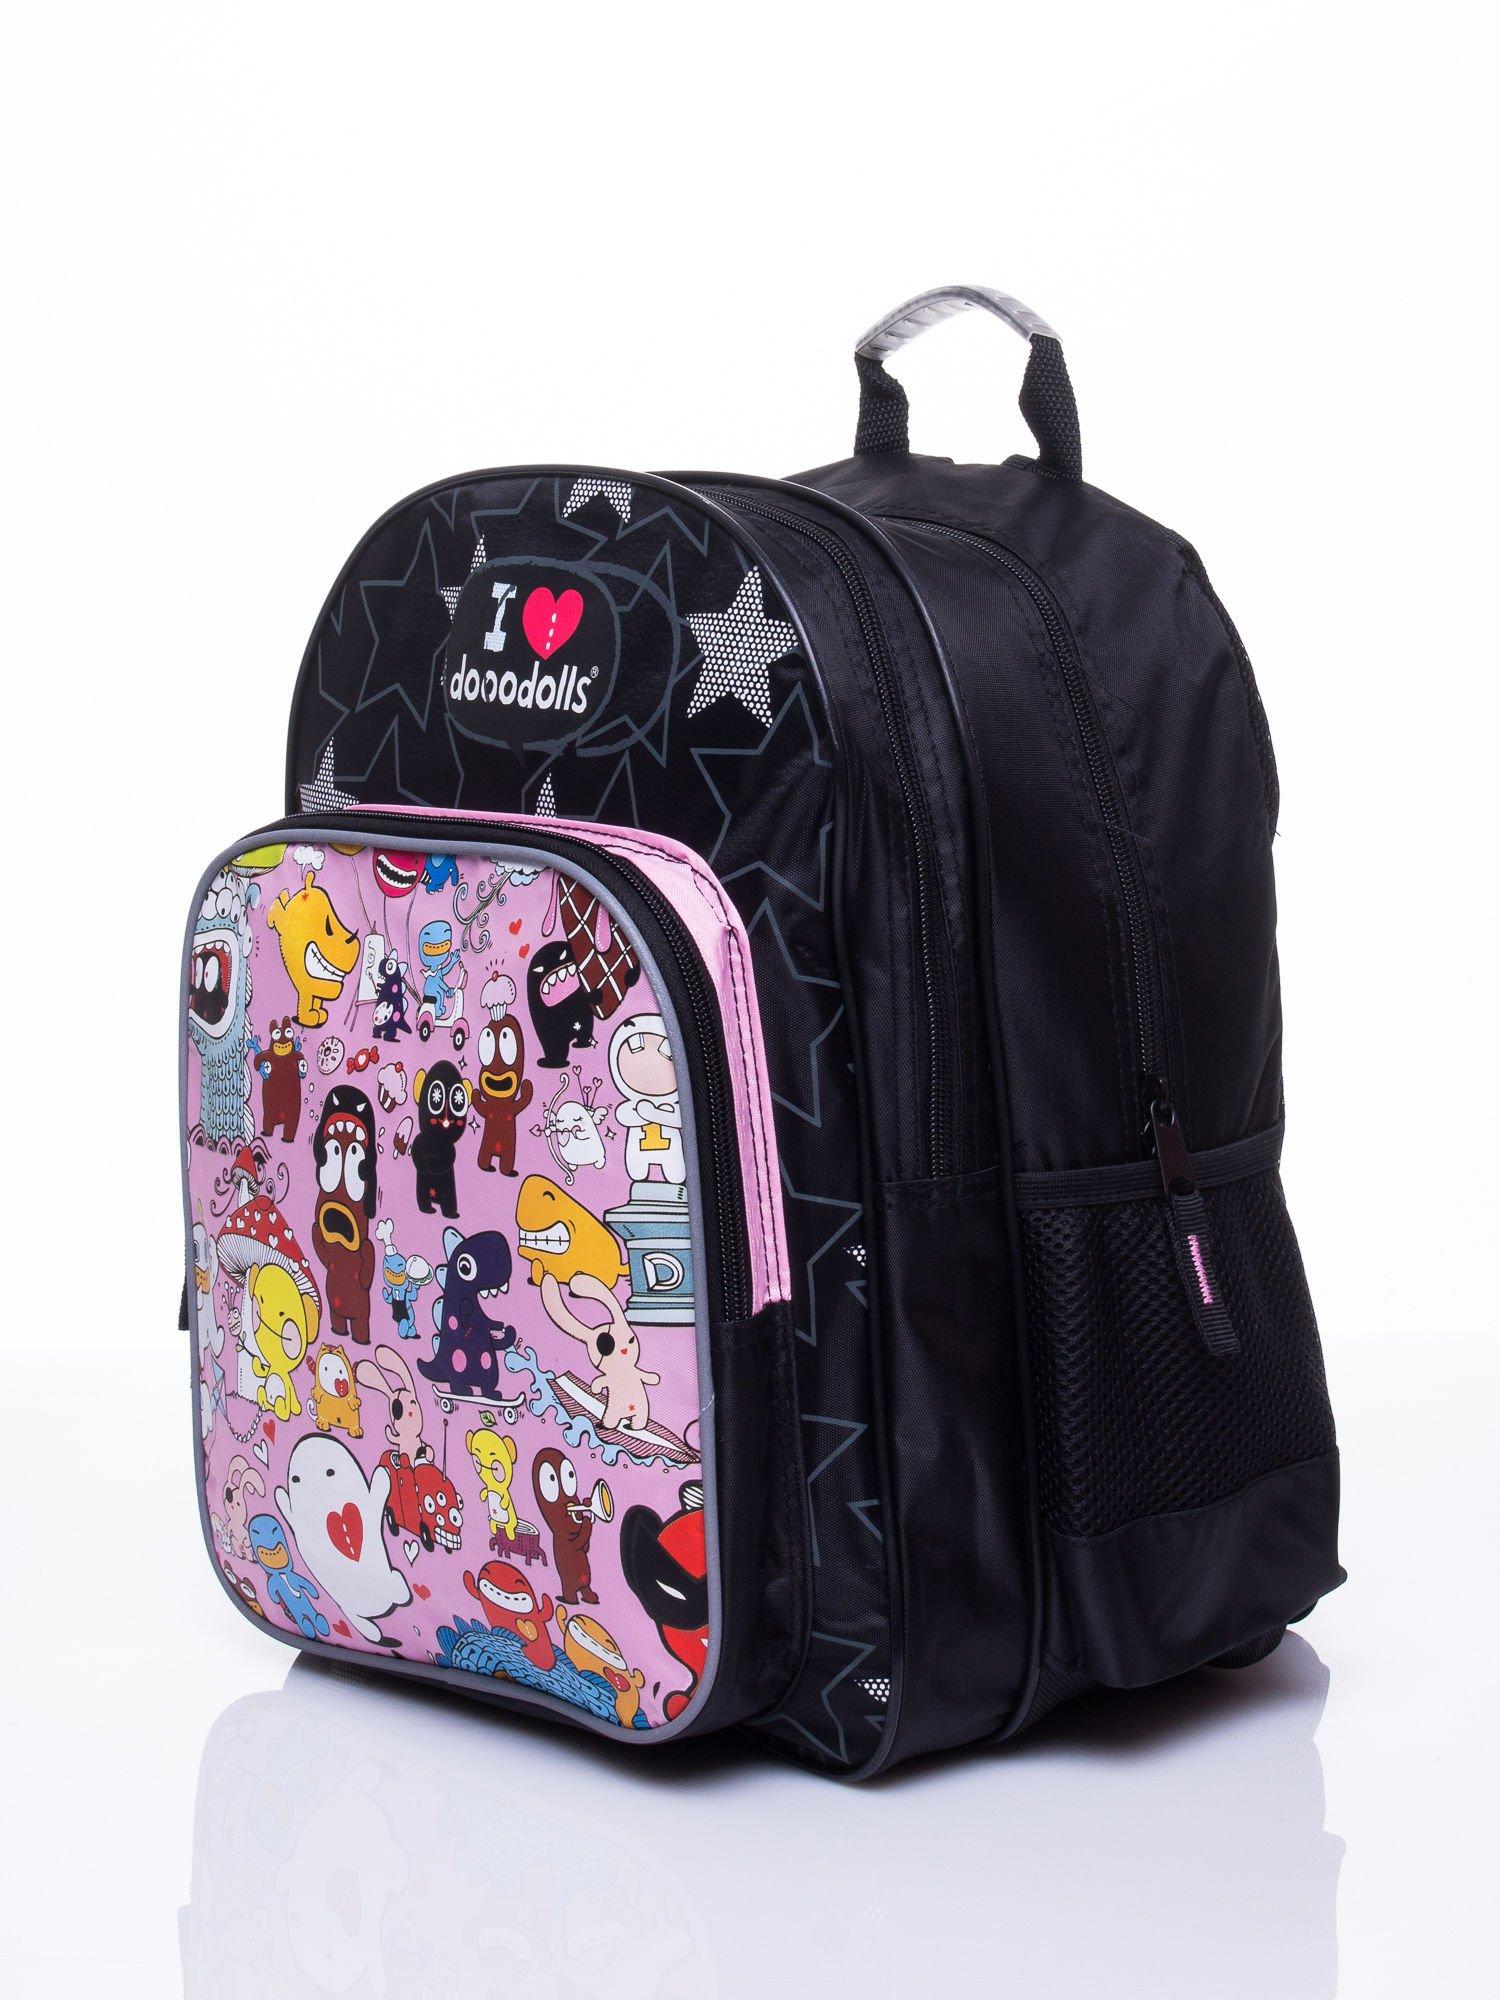 Czarny plecak szkolny DISNEY Dooodolls                                  zdj.                                  2